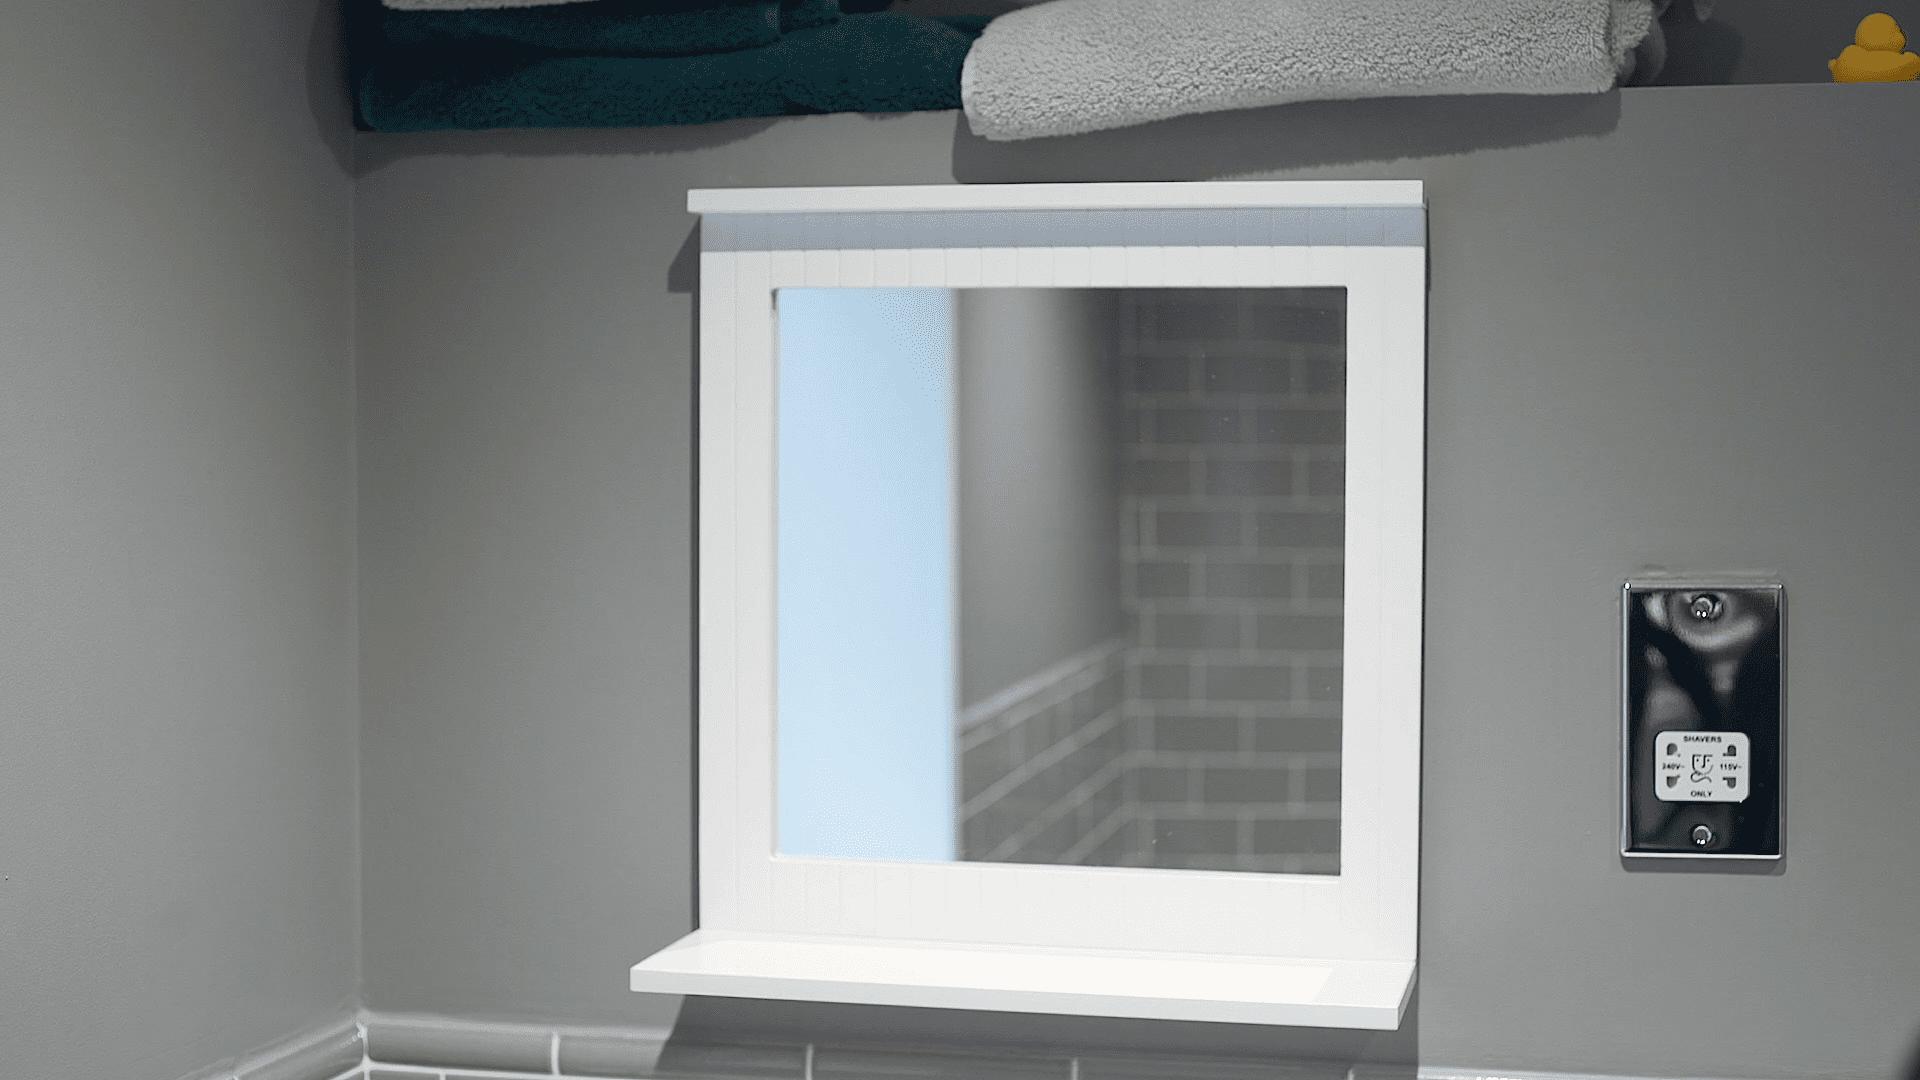 Bathroom Organization Ideas - Pick A Mirror with Storage Solutions